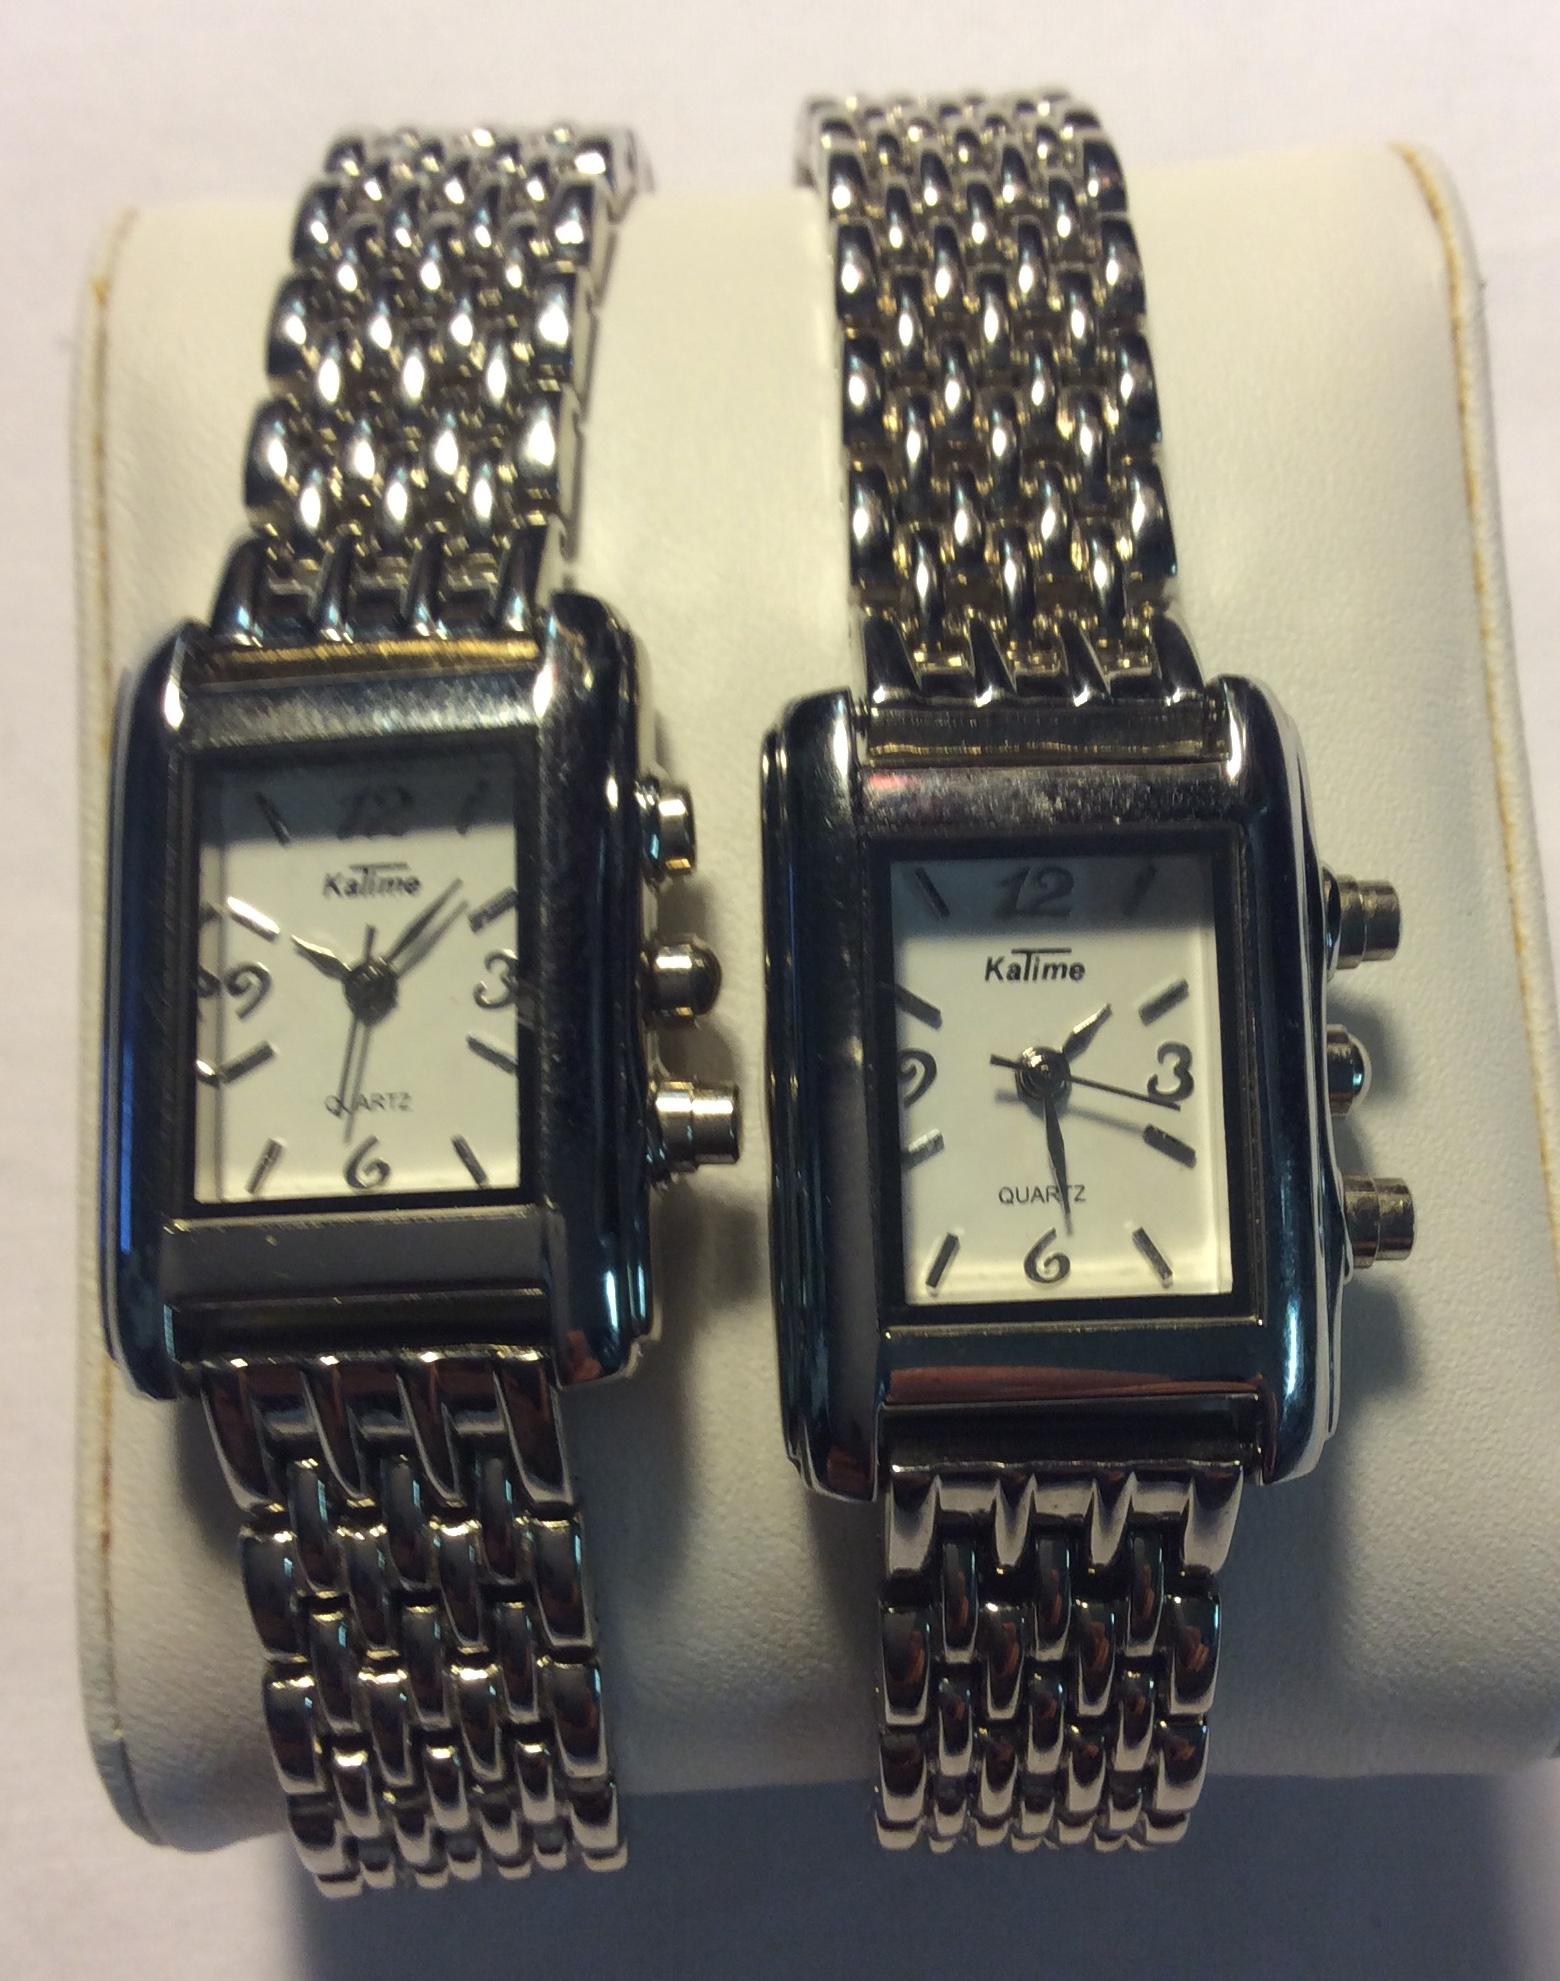 KaTime watch - rectangular white